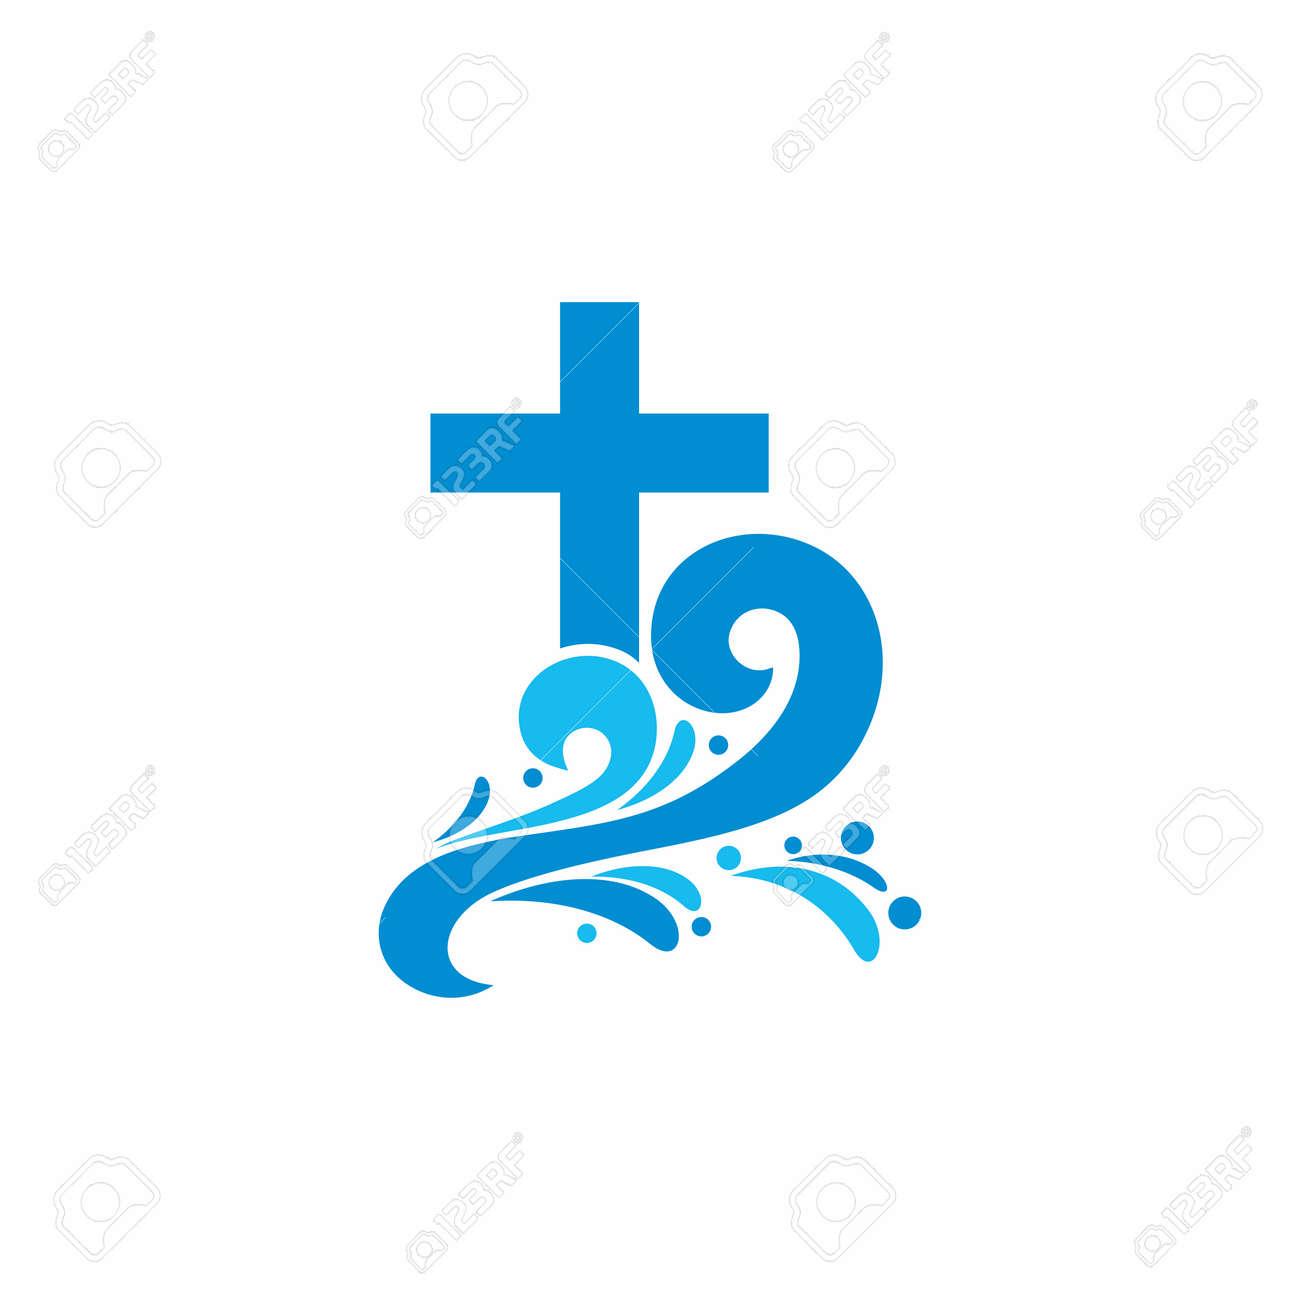 Logo church christian symbols cross and waves jesus the christian symbols cross and waves jesus the source of living buycottarizona